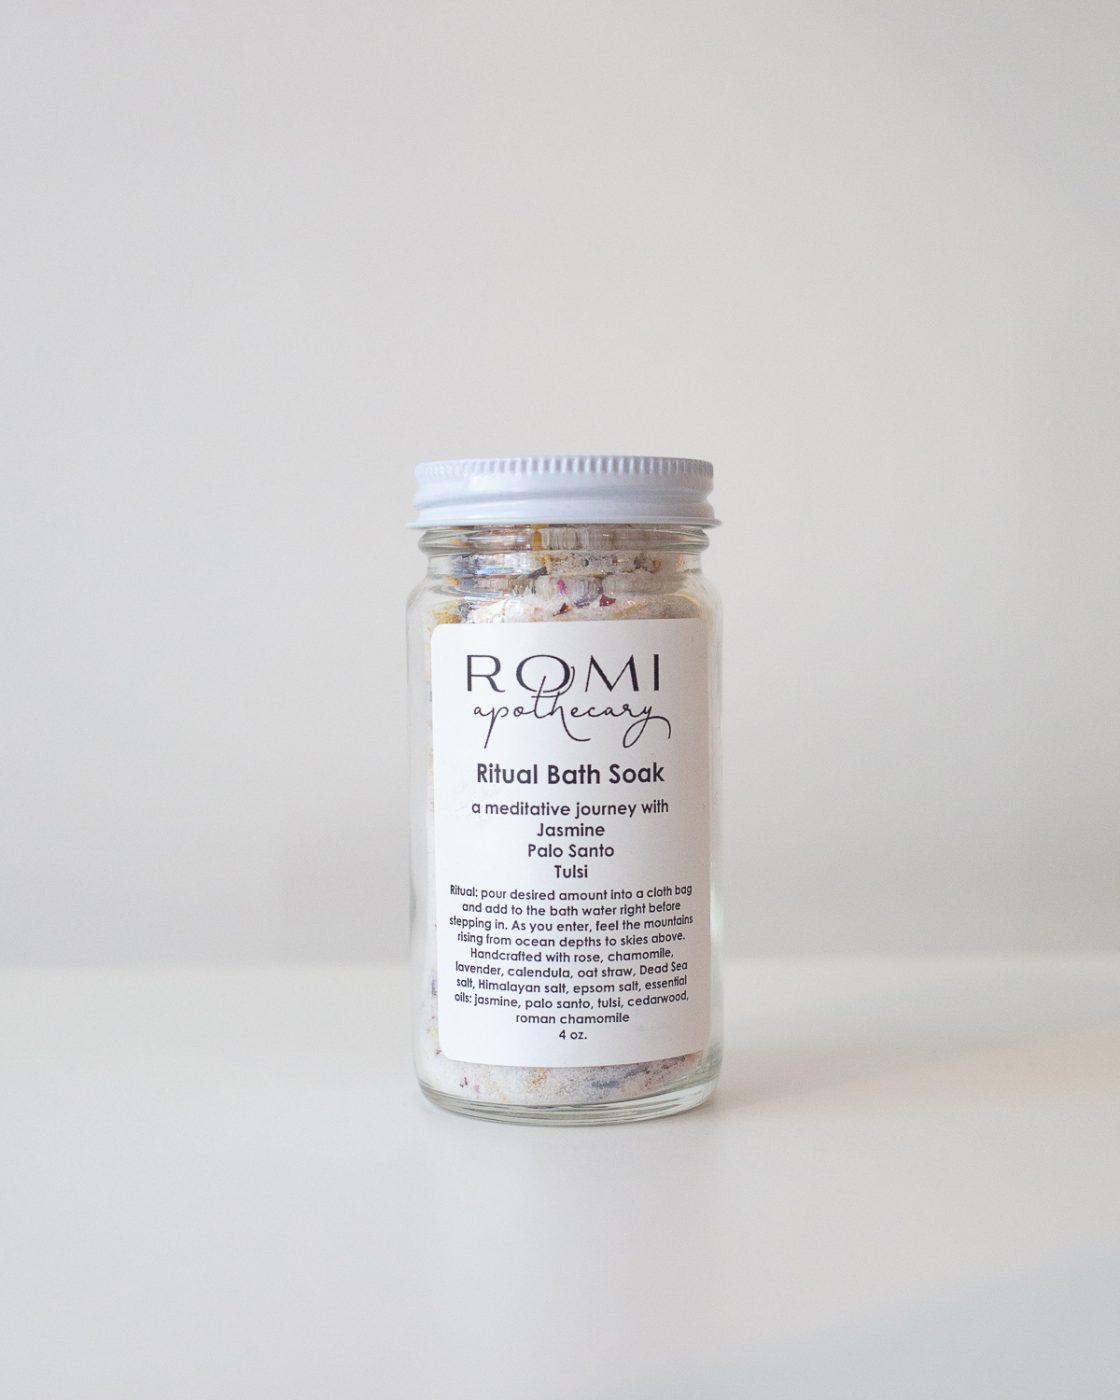 Ritual Bath Soak salts from Romi Apothecary made in Minneapolis, MN